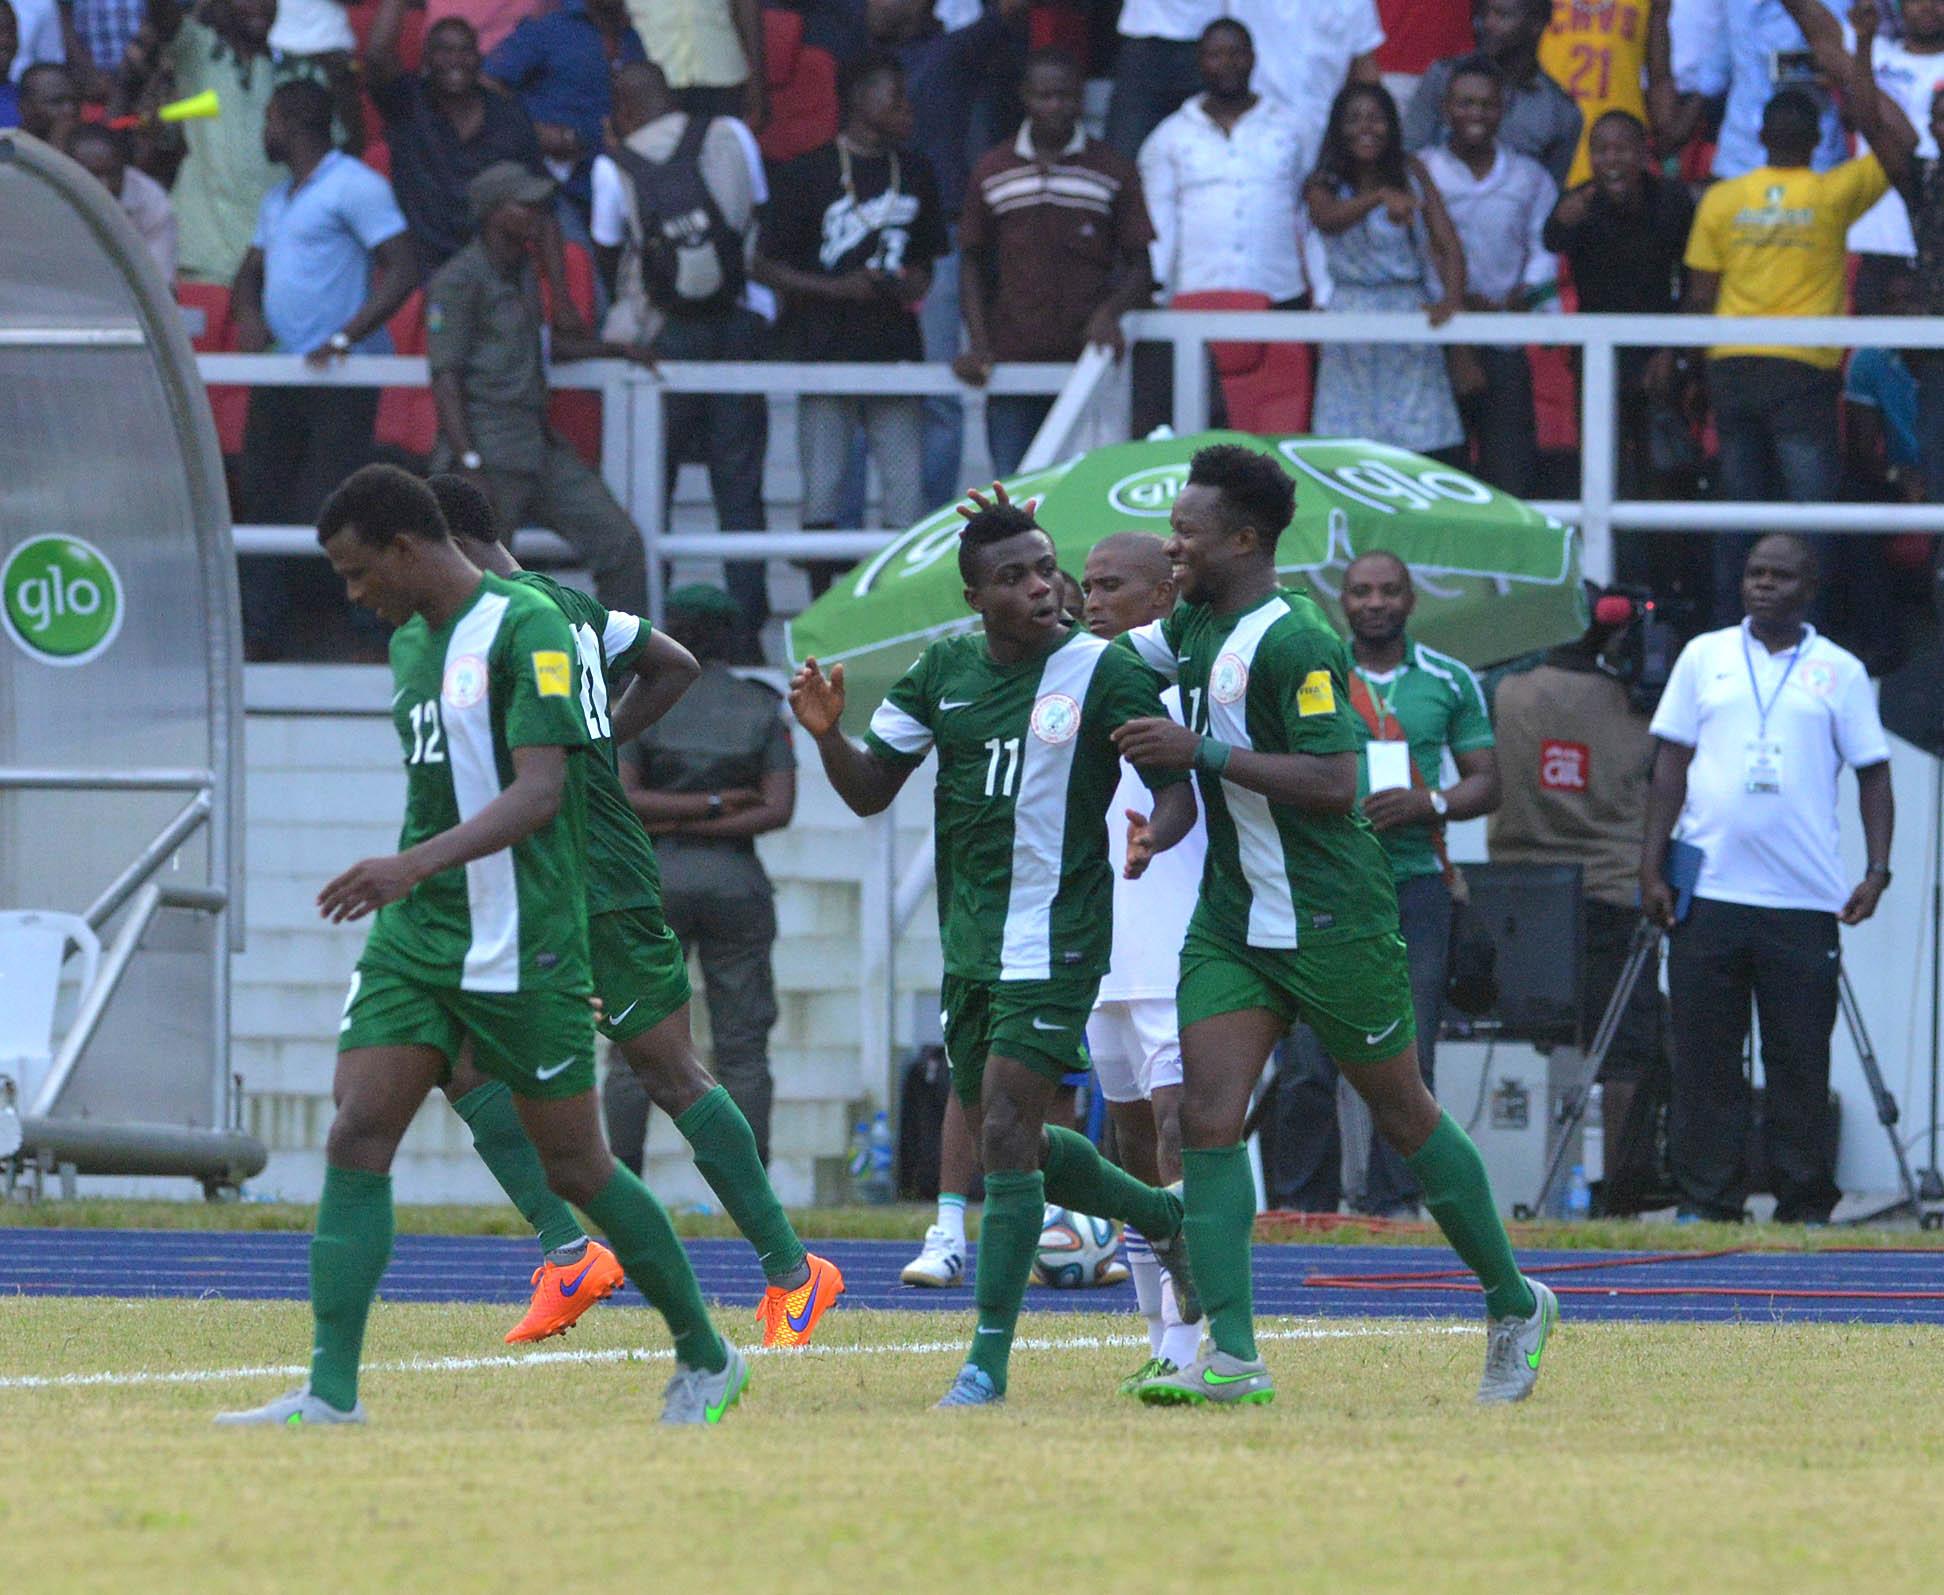 Etim Esin: Eagles Must Improve On Away Games